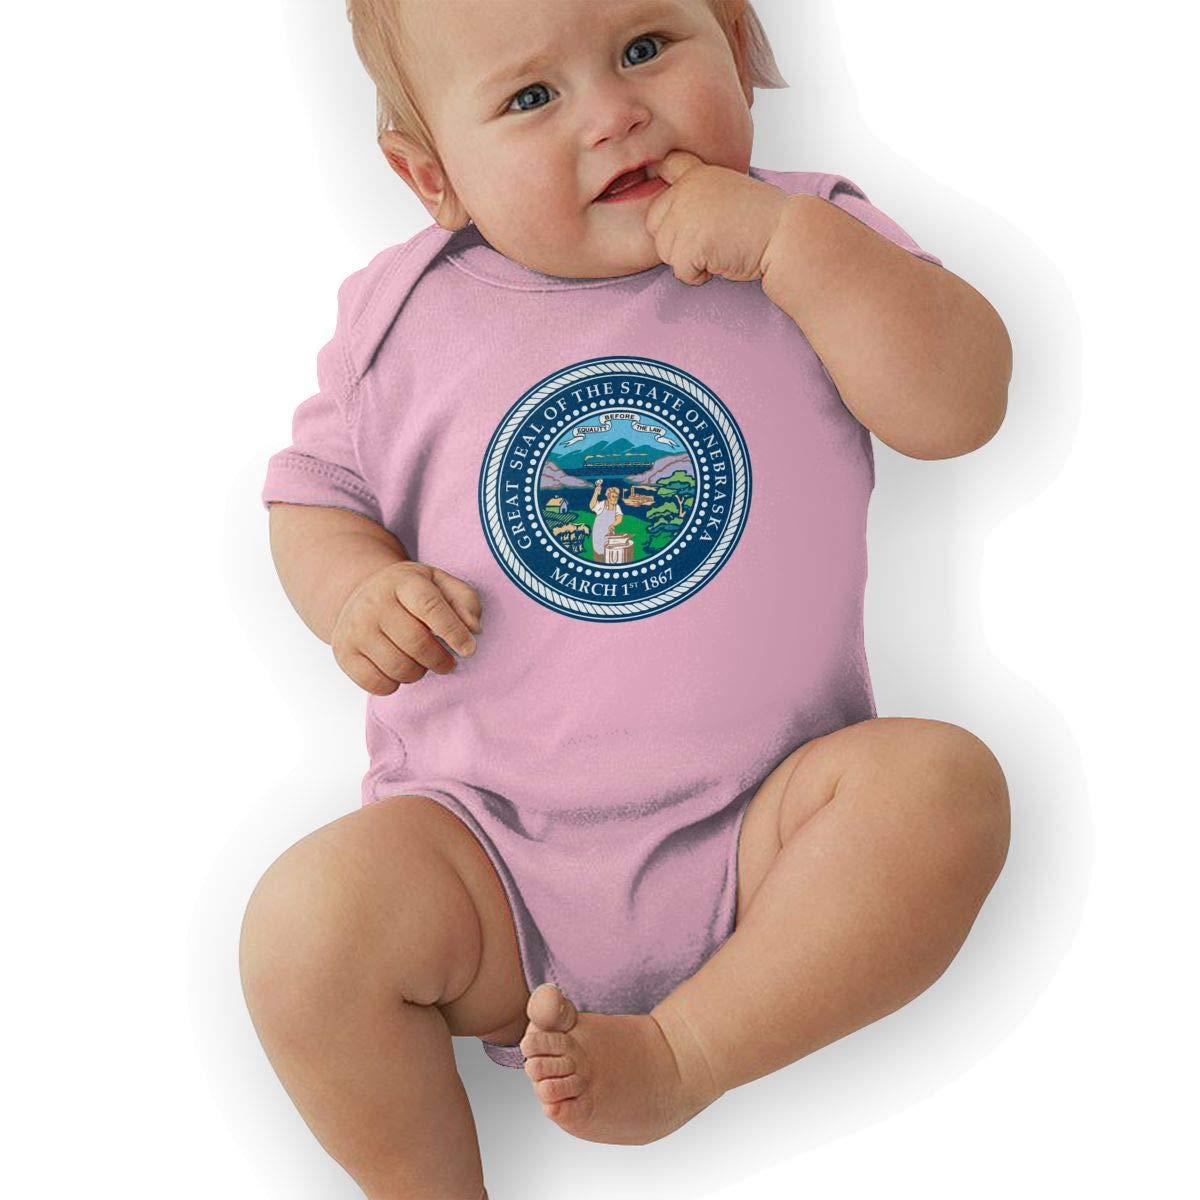 HappyLifea Nebraska State Seal Newborn Baby Short Sleeve Romper Infant Summer Clothing